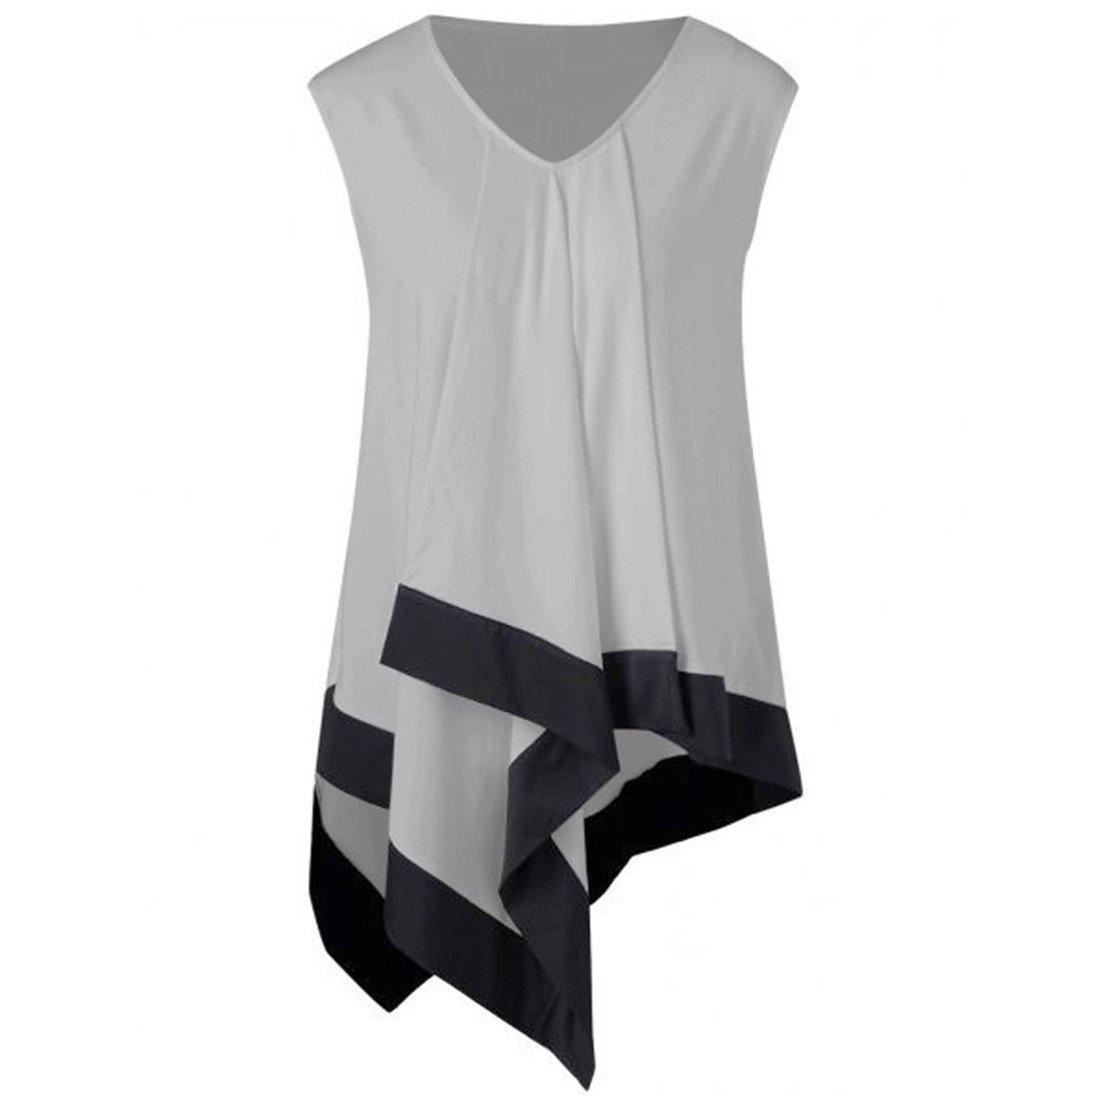 f989103d8f33c Amazon.com  ZHANGVIP Women Sleeveless V Neck T-Shirts Casual Loose  Irregular Summer Casual Loose Tank Top Vest Tee  Clothing